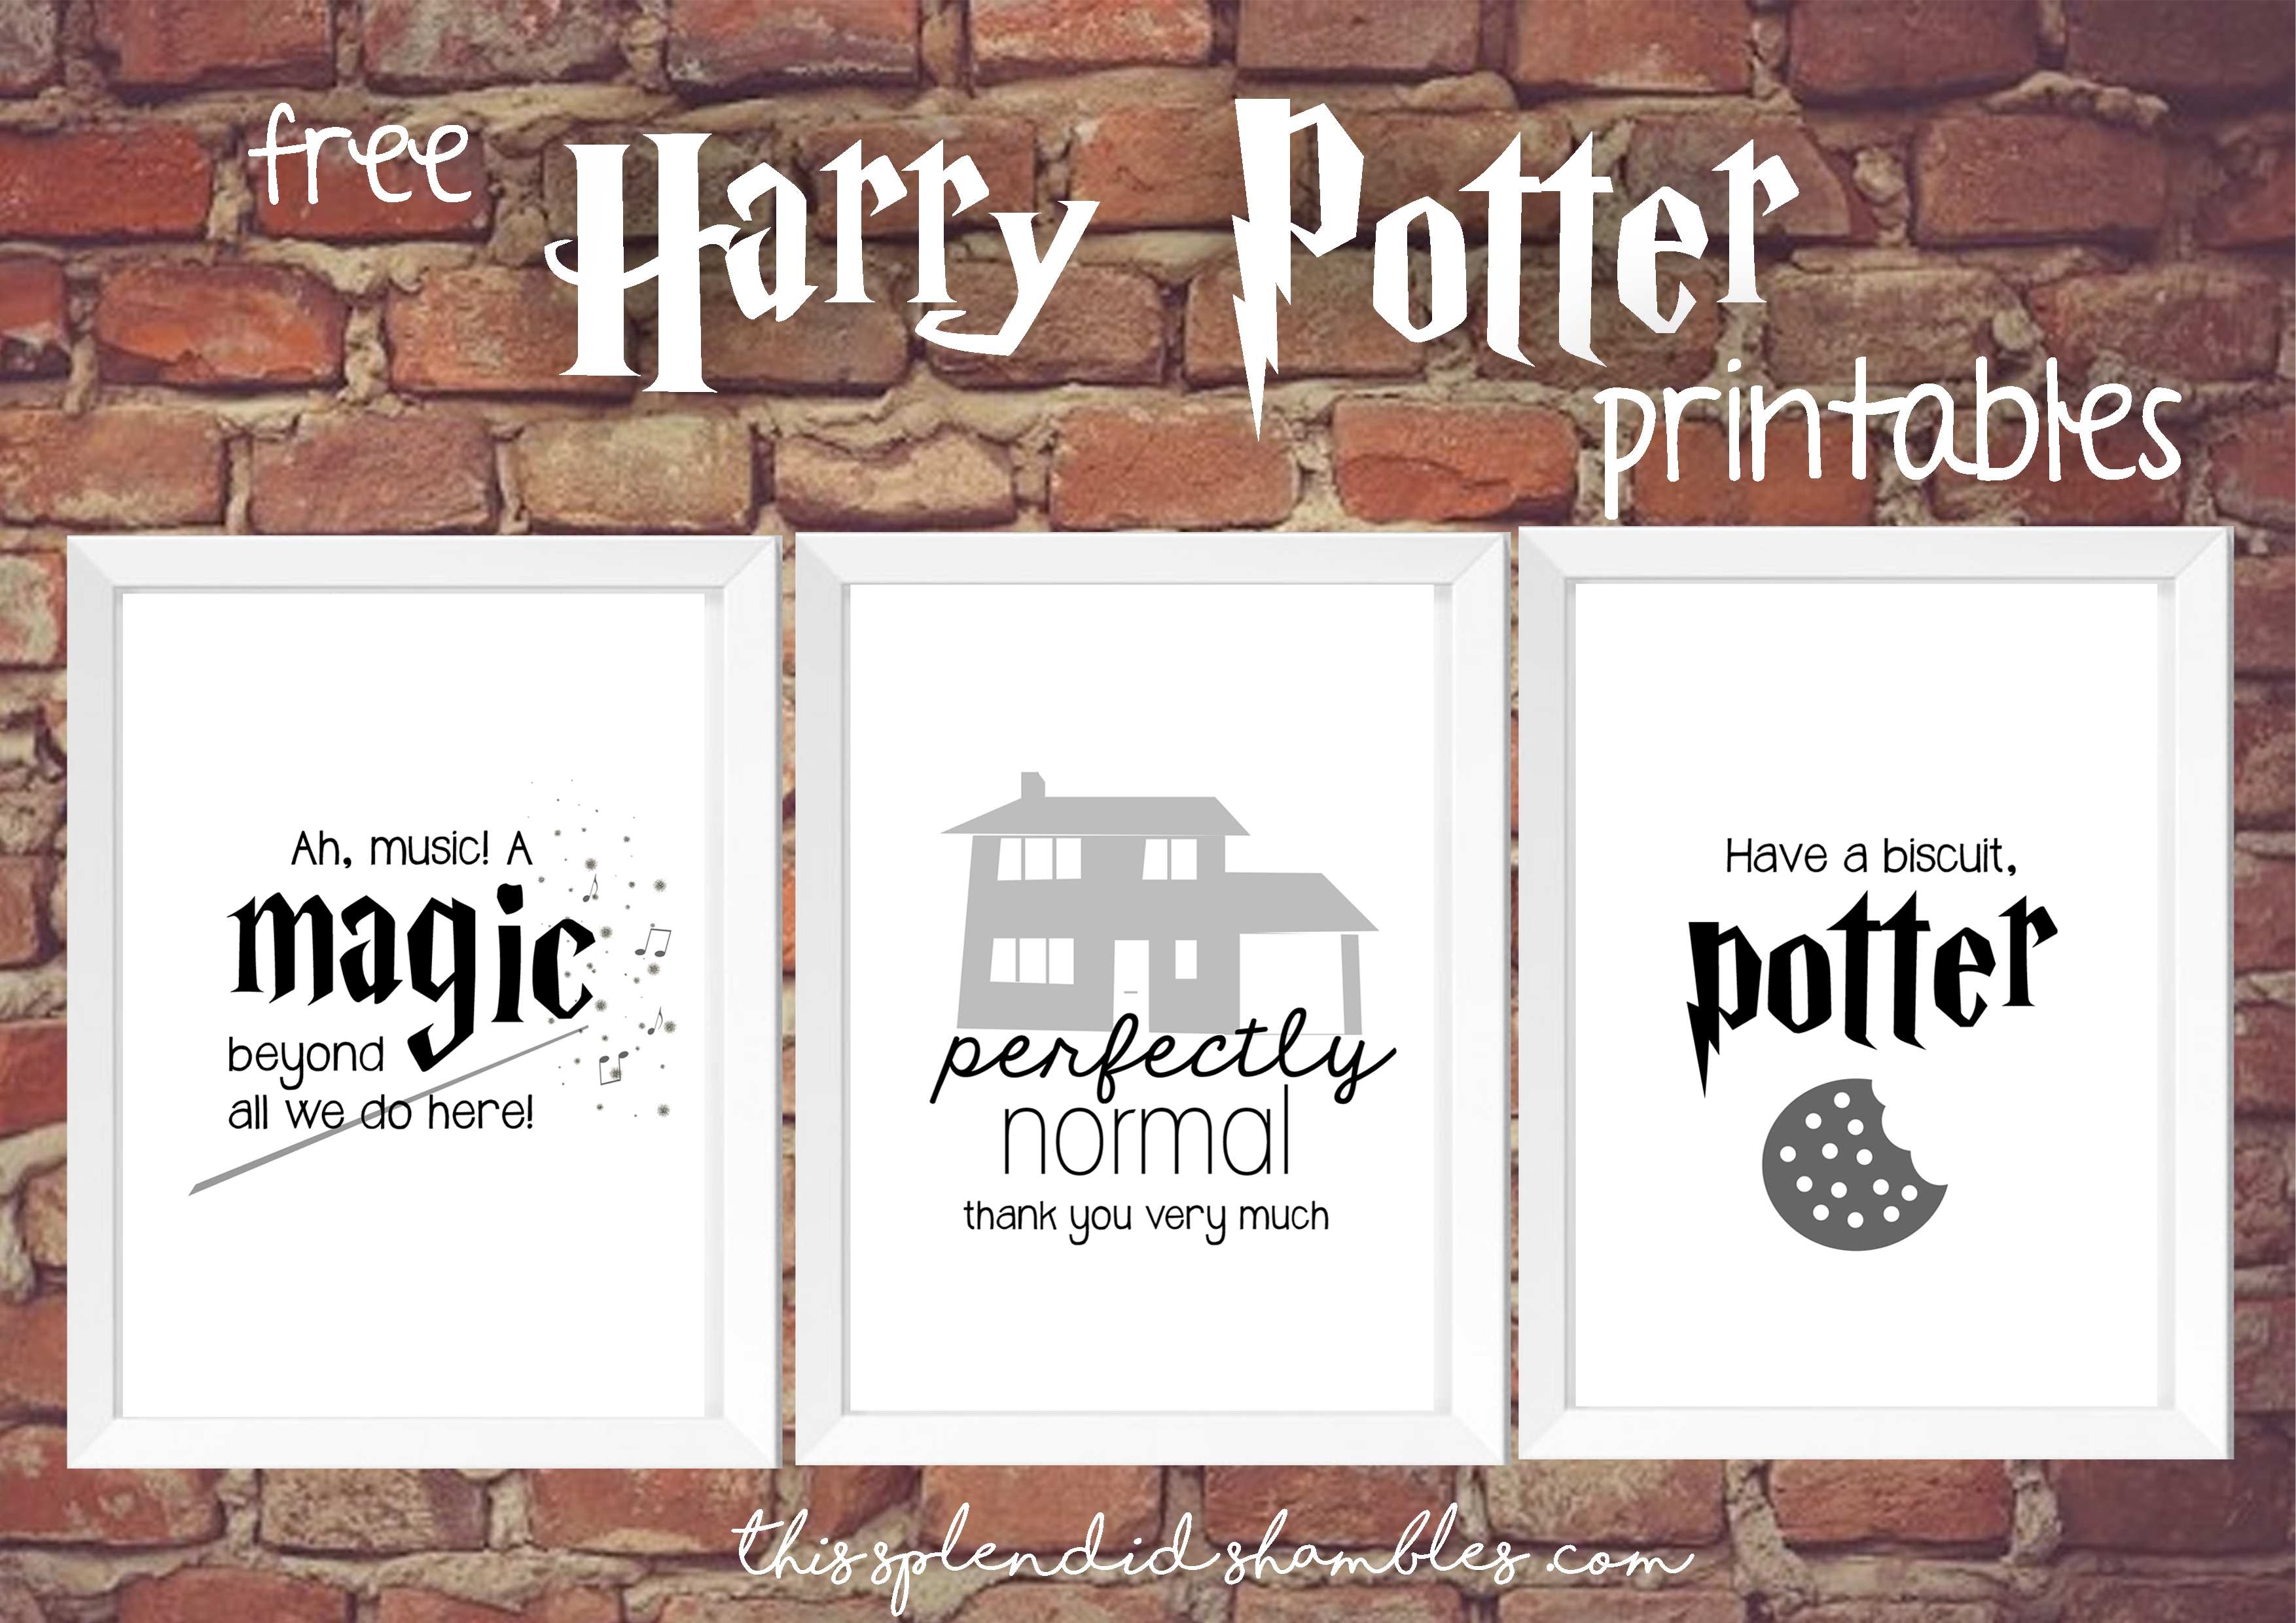 Free Printables Harry Potter | Bestprintable231118 - Free Printable Harry Potter Pictures